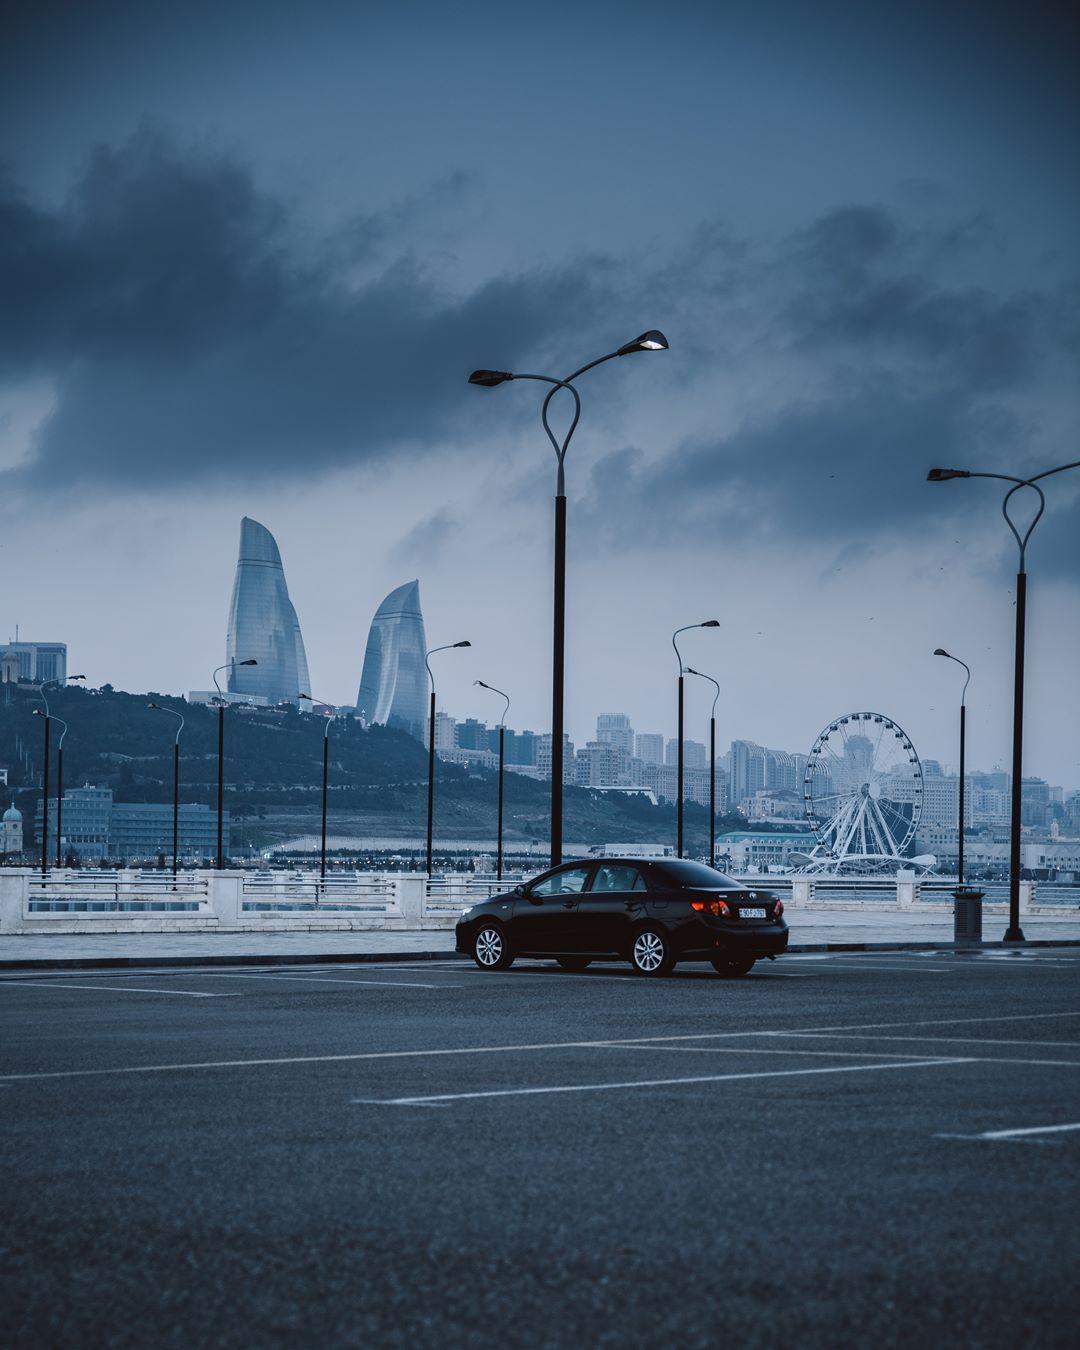 Pin By Targulu Khasiyev On Azerbaycan Azerbaijan Travel Baku City Baku Azerbaijan